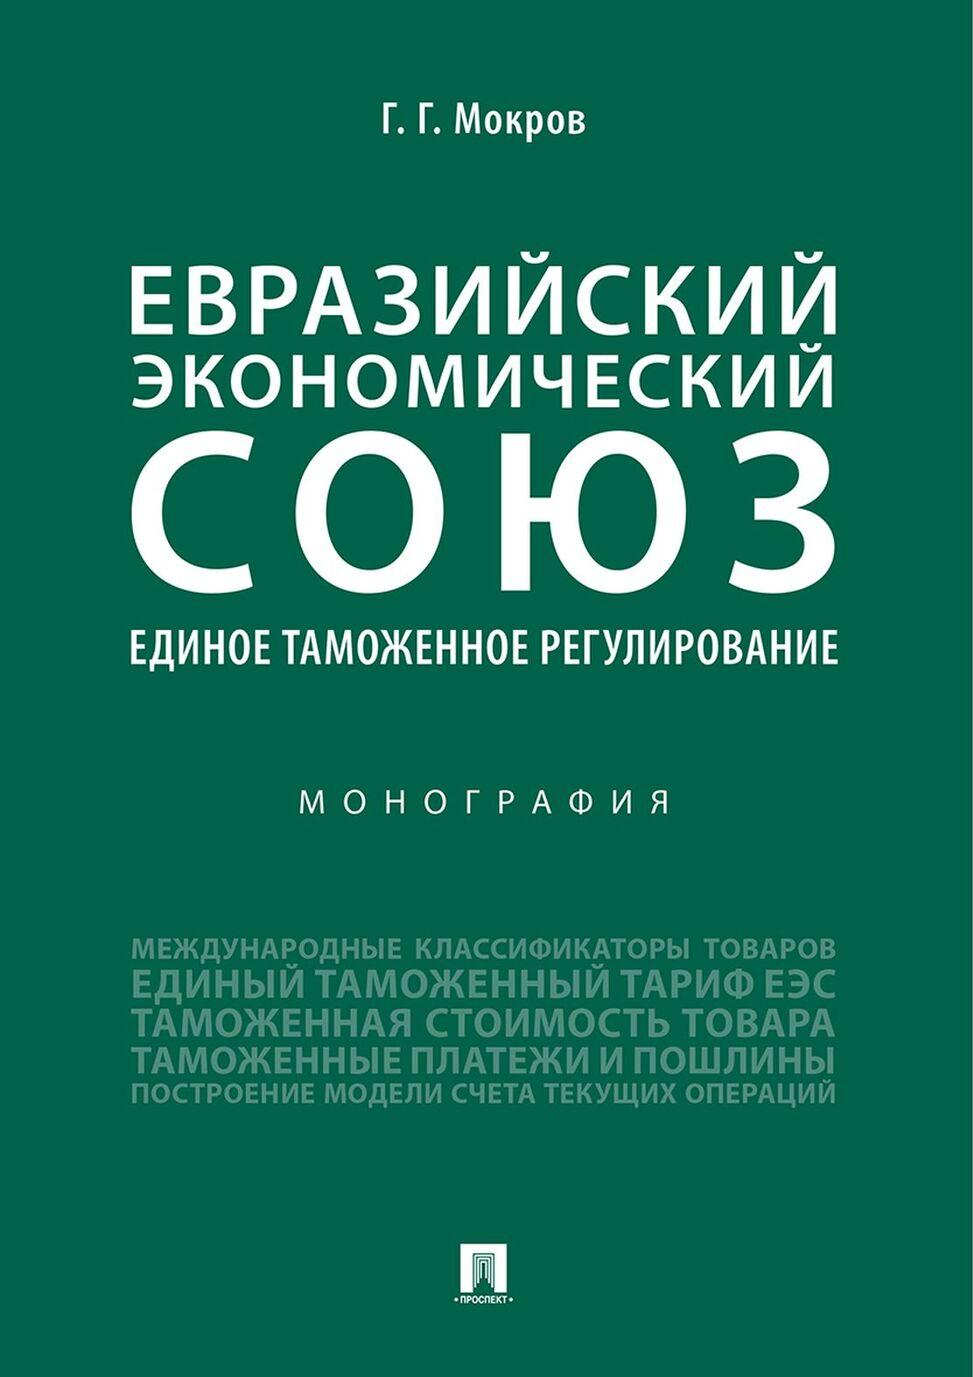 Evrazijskij ekonomicheskij sojuz. Edinoe tamozhennoe regulirovanie. Monografija